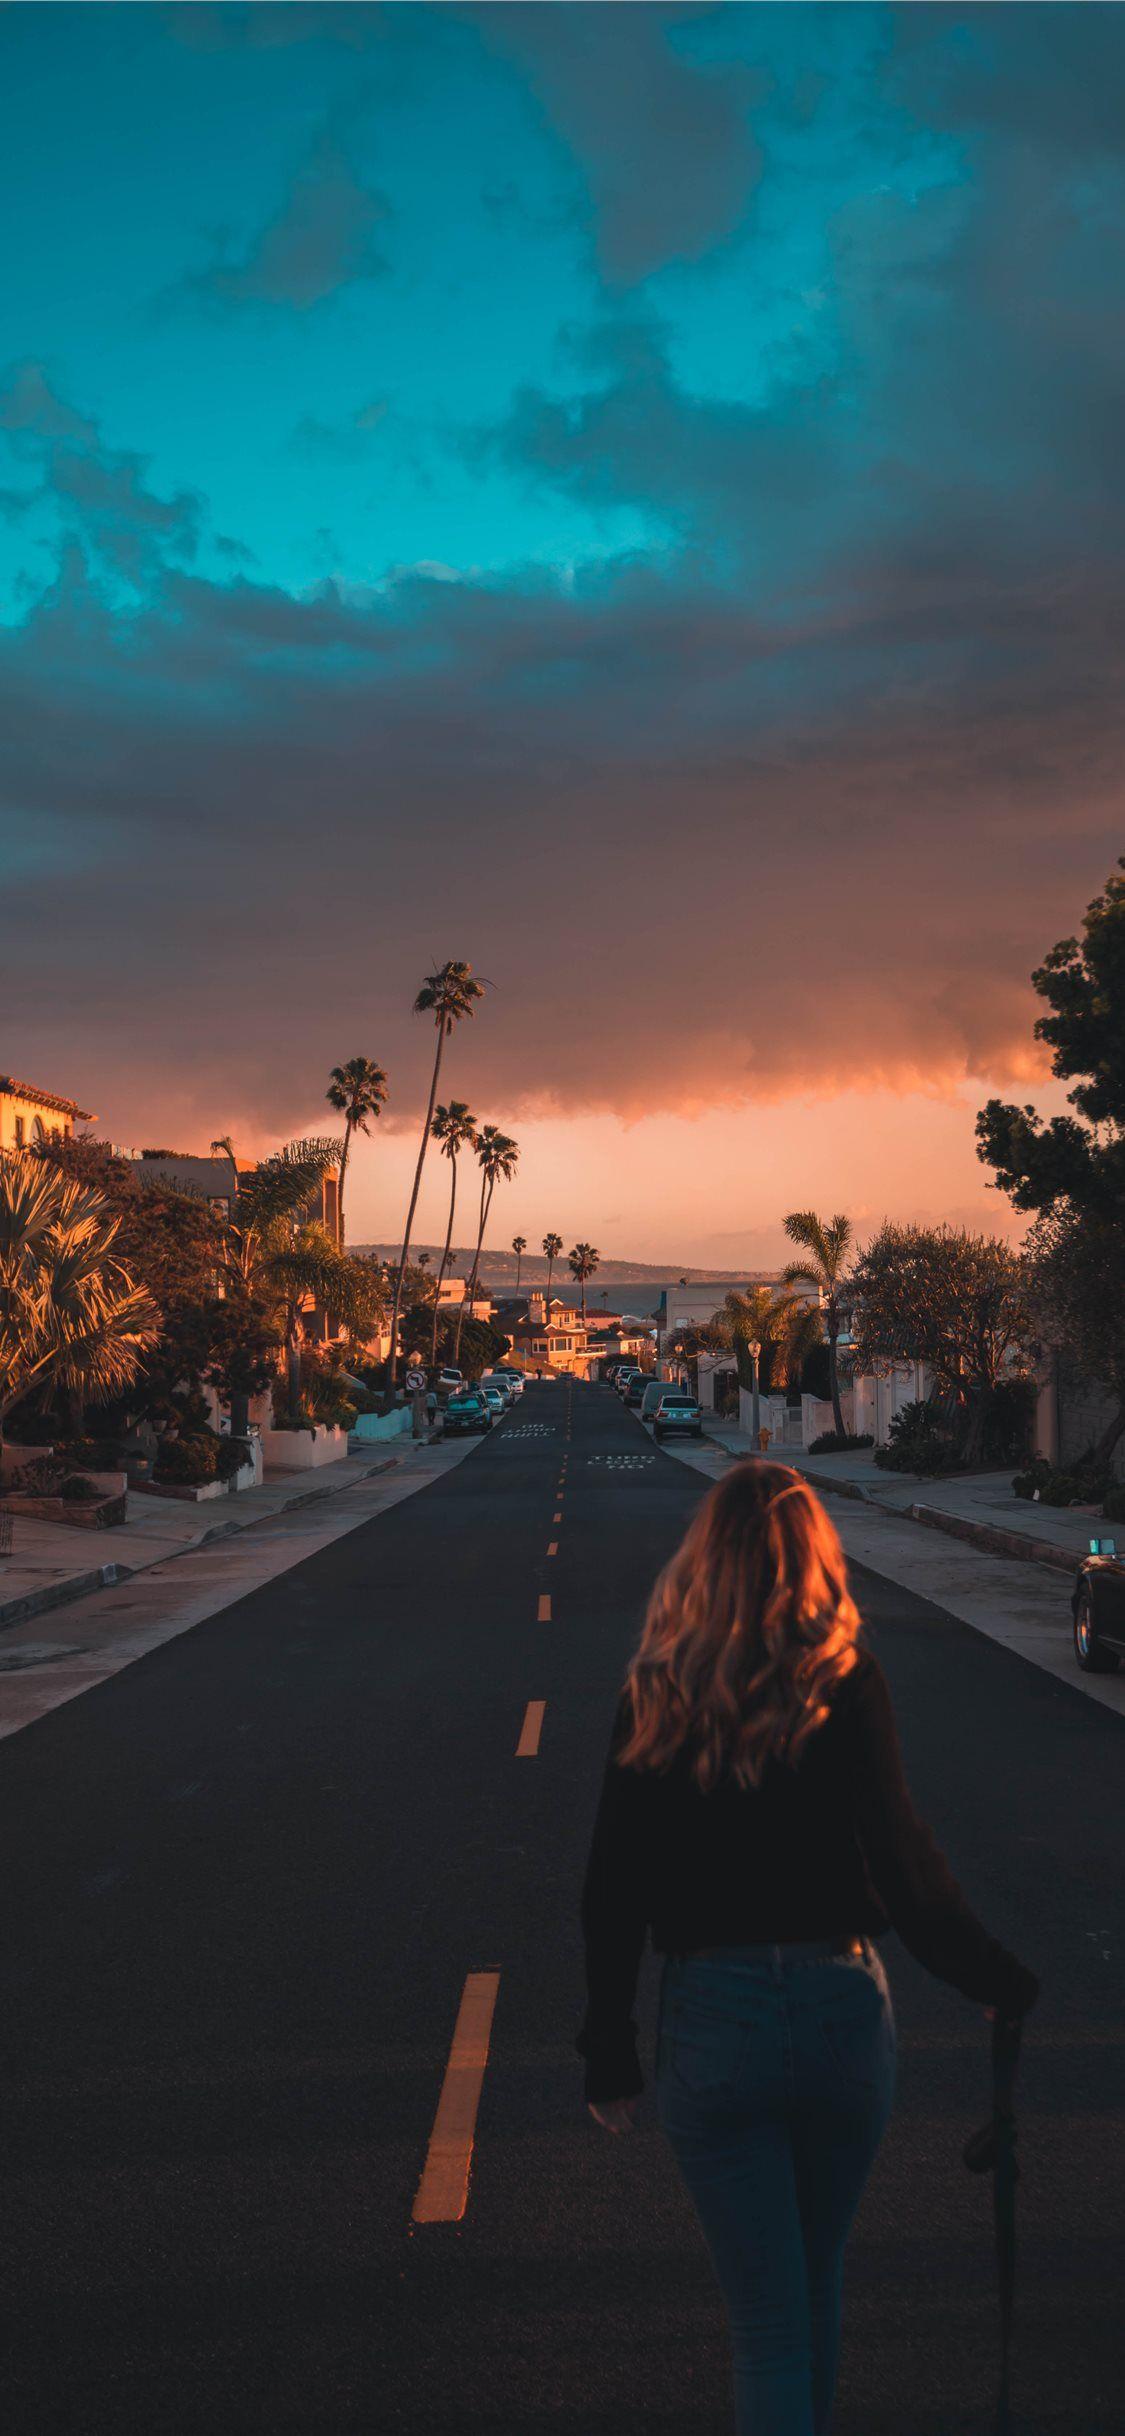 Golden Glows in California iPhone X Wallpapers in 2020